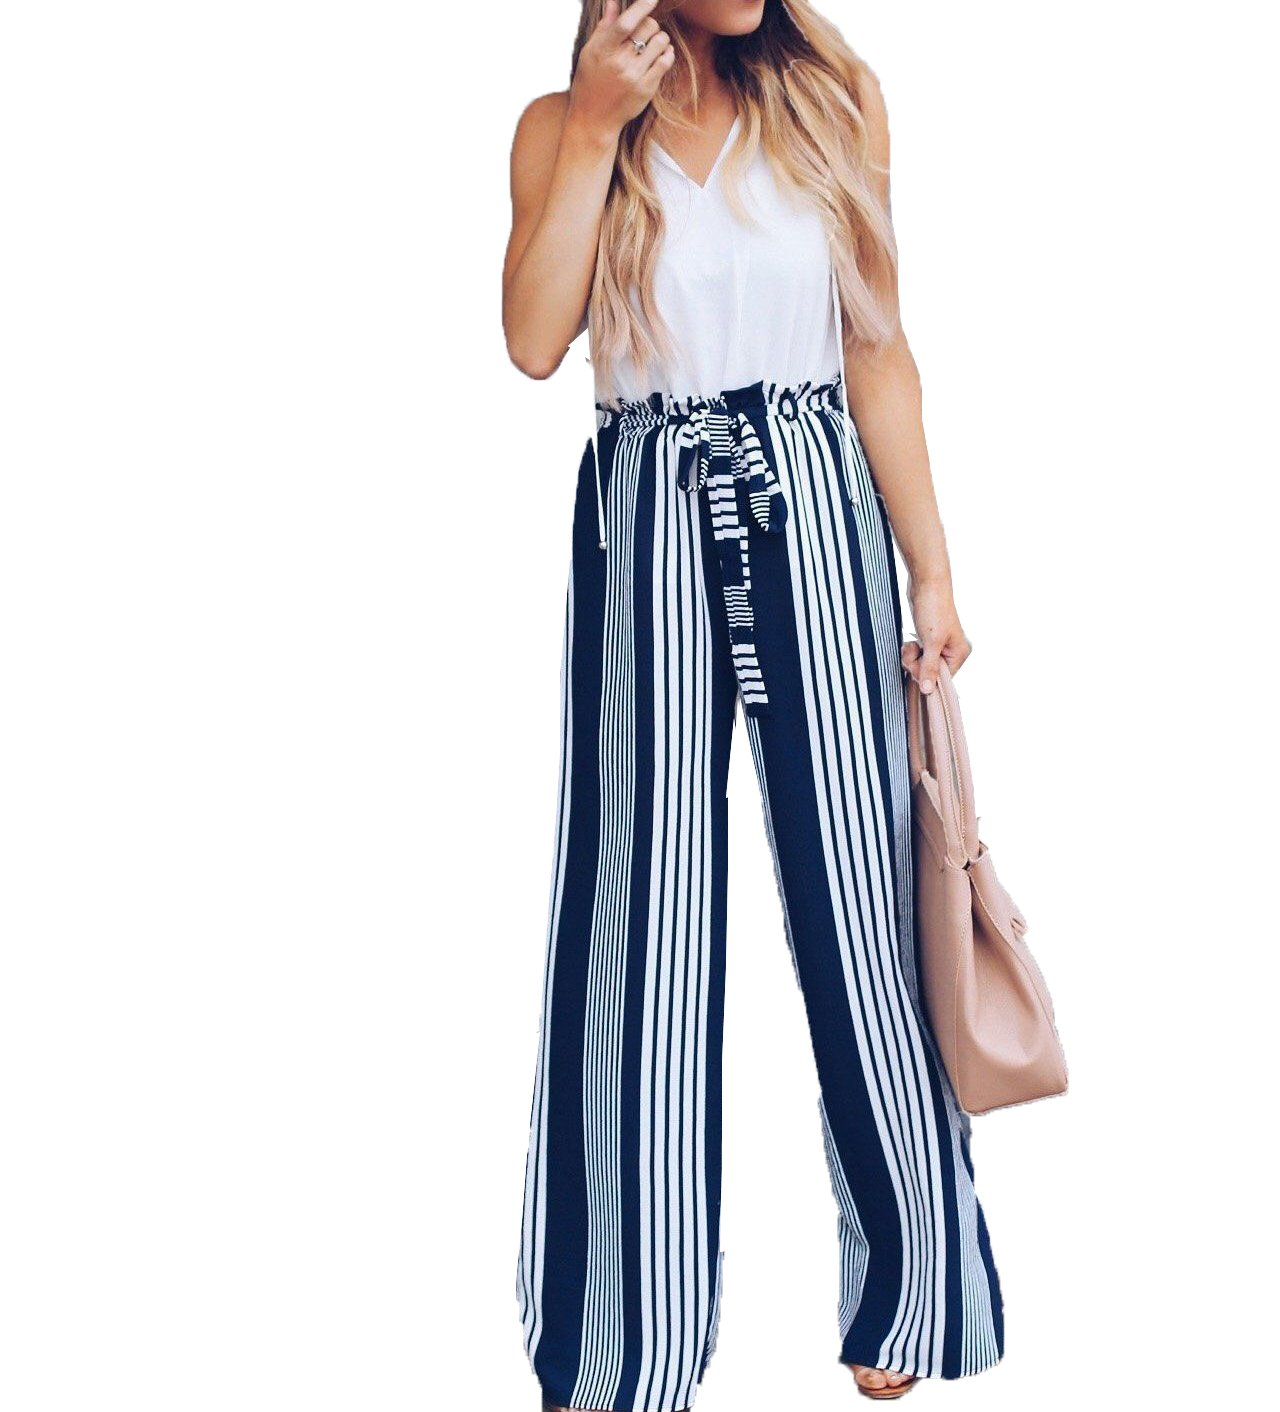 Asrlet Fashion Women High Waist Wide Leg Long Pants Summer Casual Stripped Trousers (US 8-10 (TAGL))